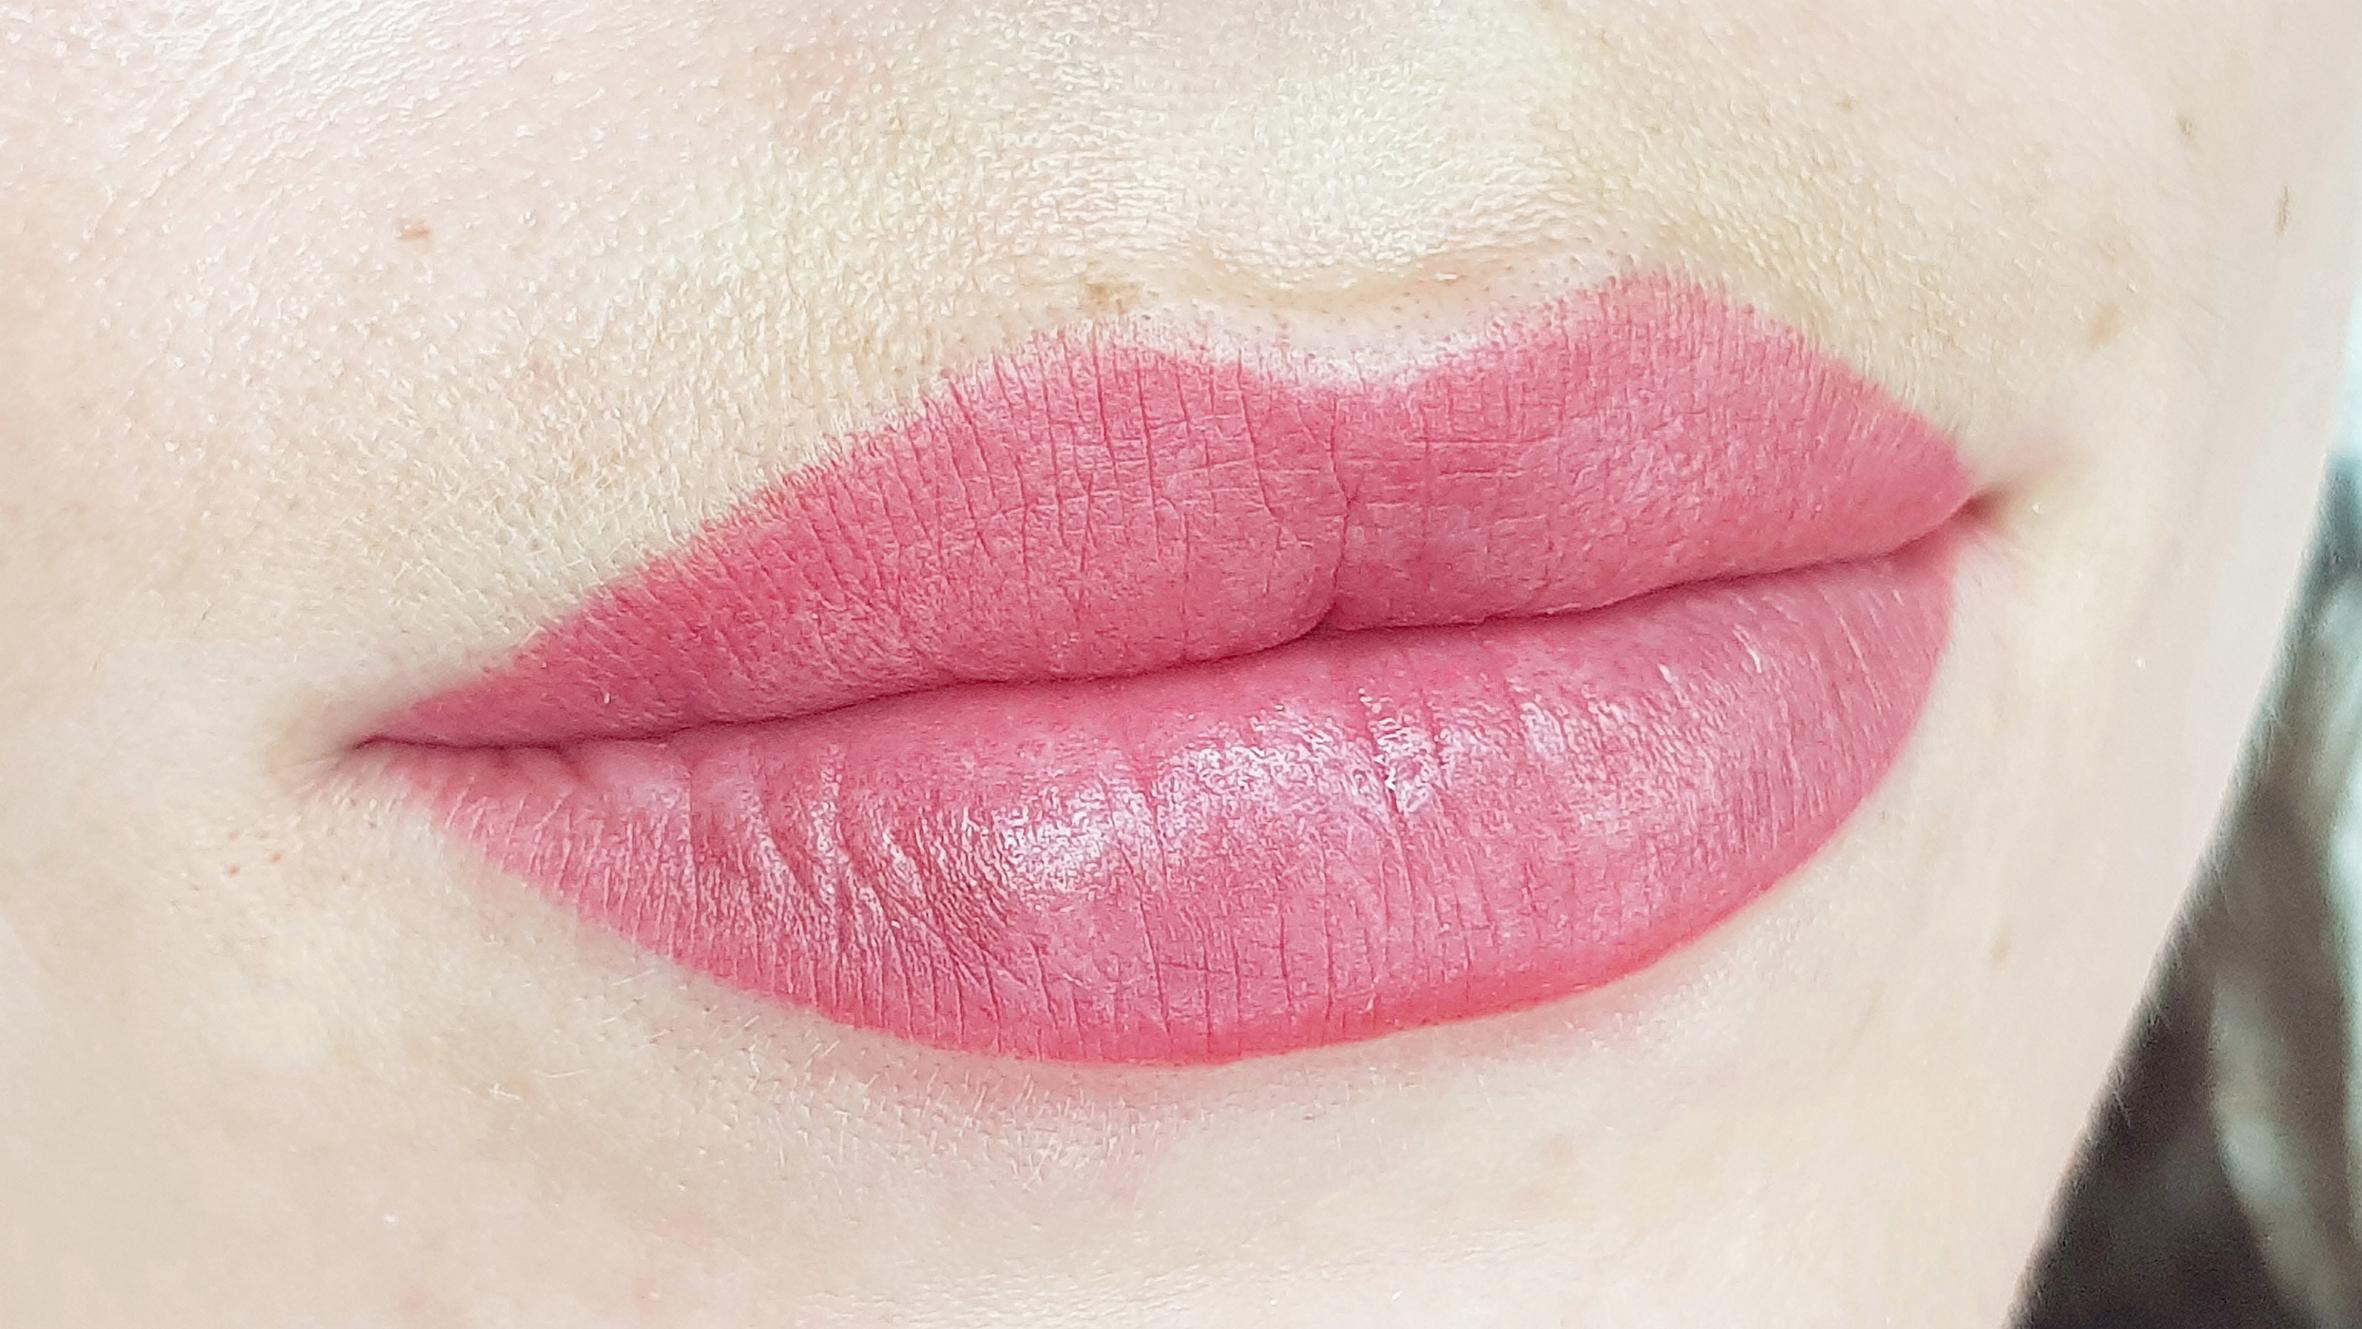 viktoria logoida tecnica sfumatura velours lips labbra